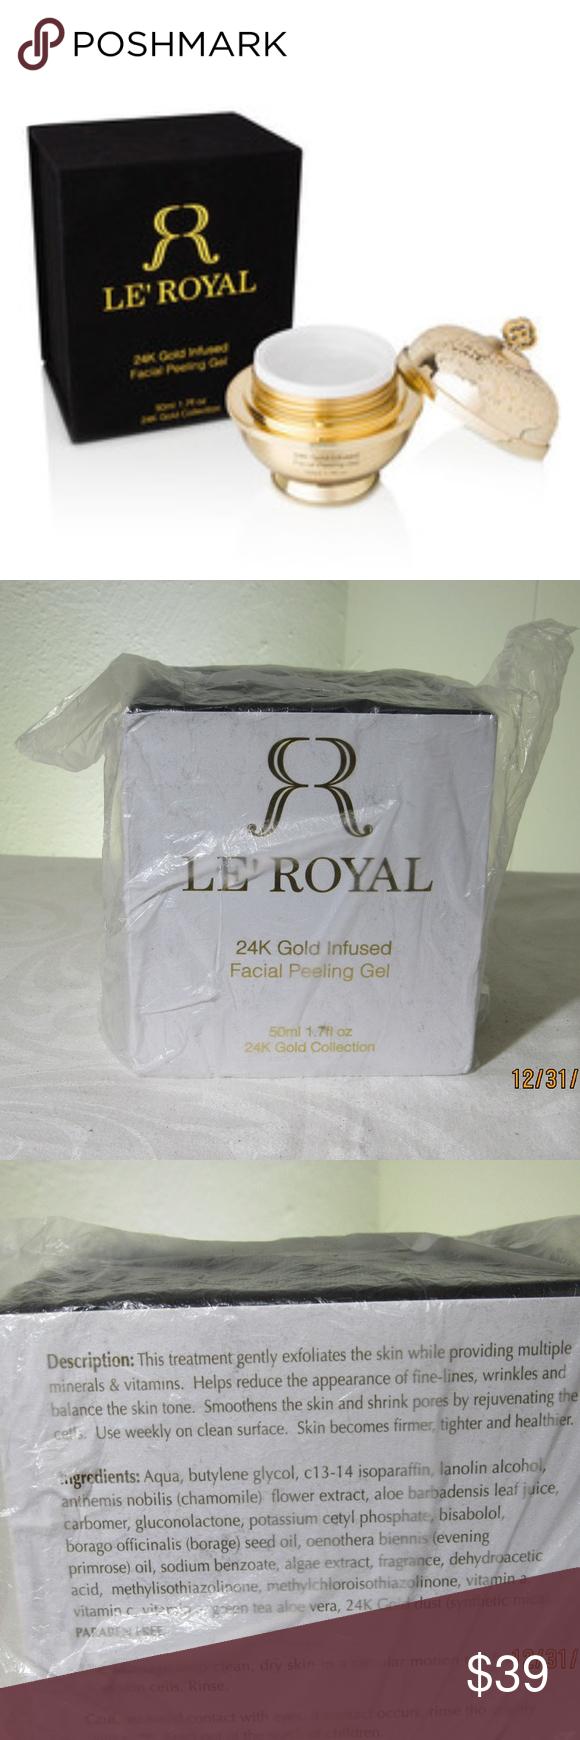 Le Royal 24k Gold Infused Facial Peeling Gel Le Royal 24k Gold Infused Facial Peeling Gel Le Royal Makeup In 2020 24k Gold Infused Gel